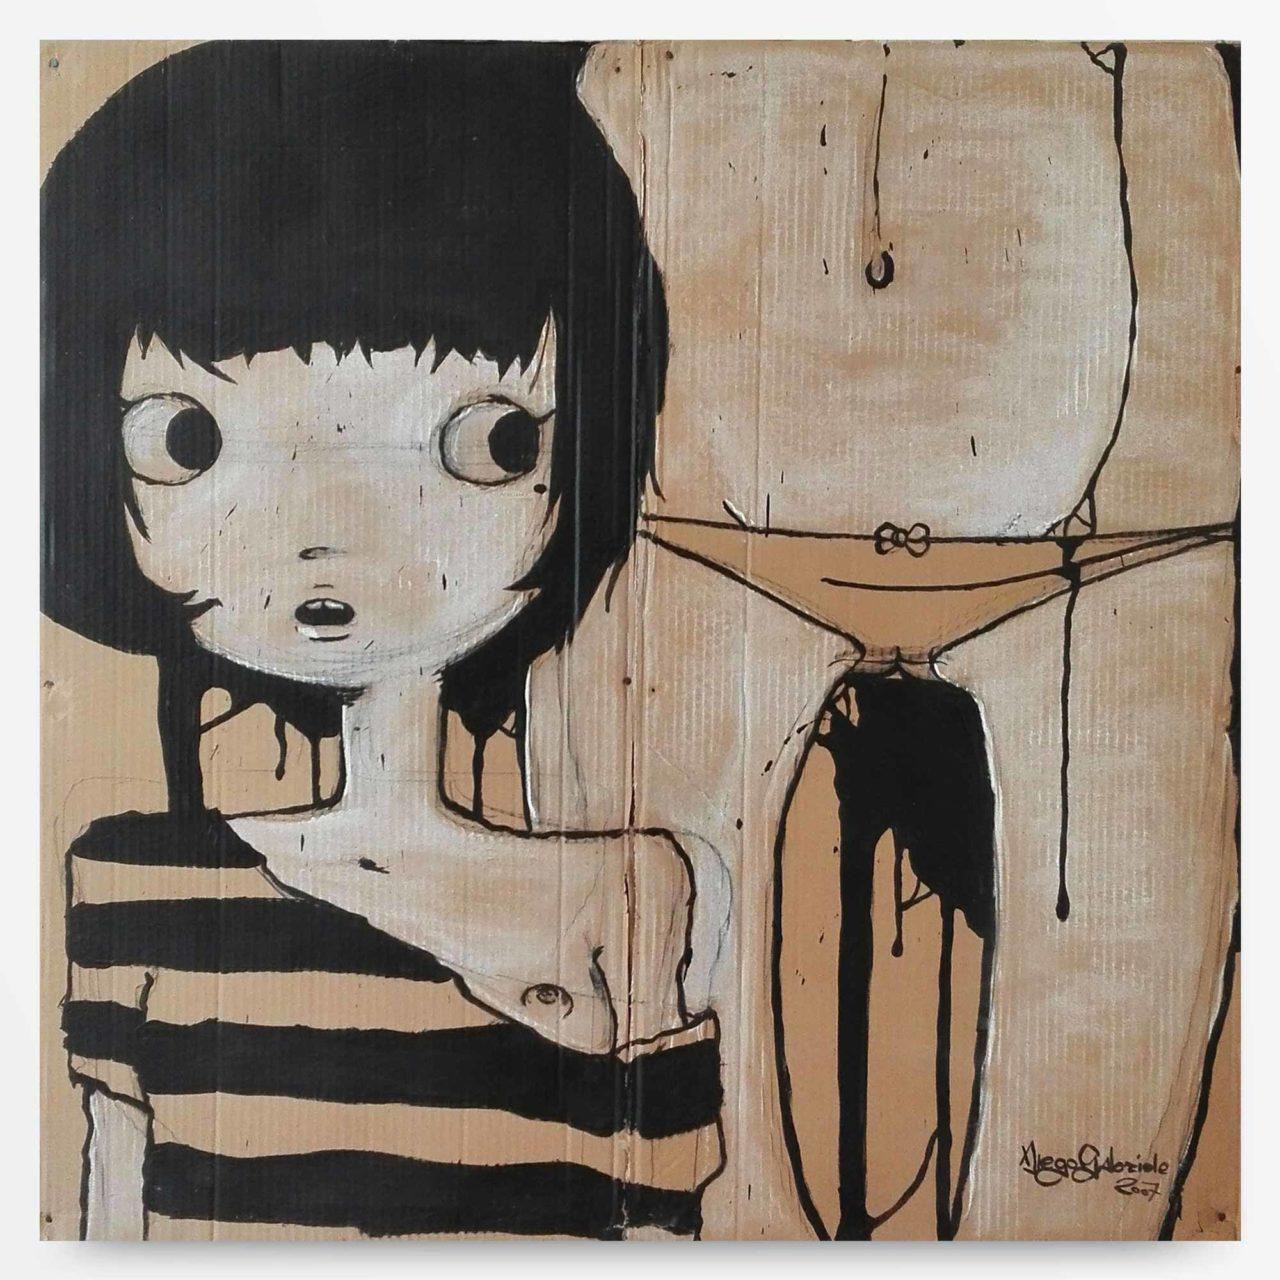 lowbrow art Conosciamoci Quadro ad acrilico di Diego Gabriele